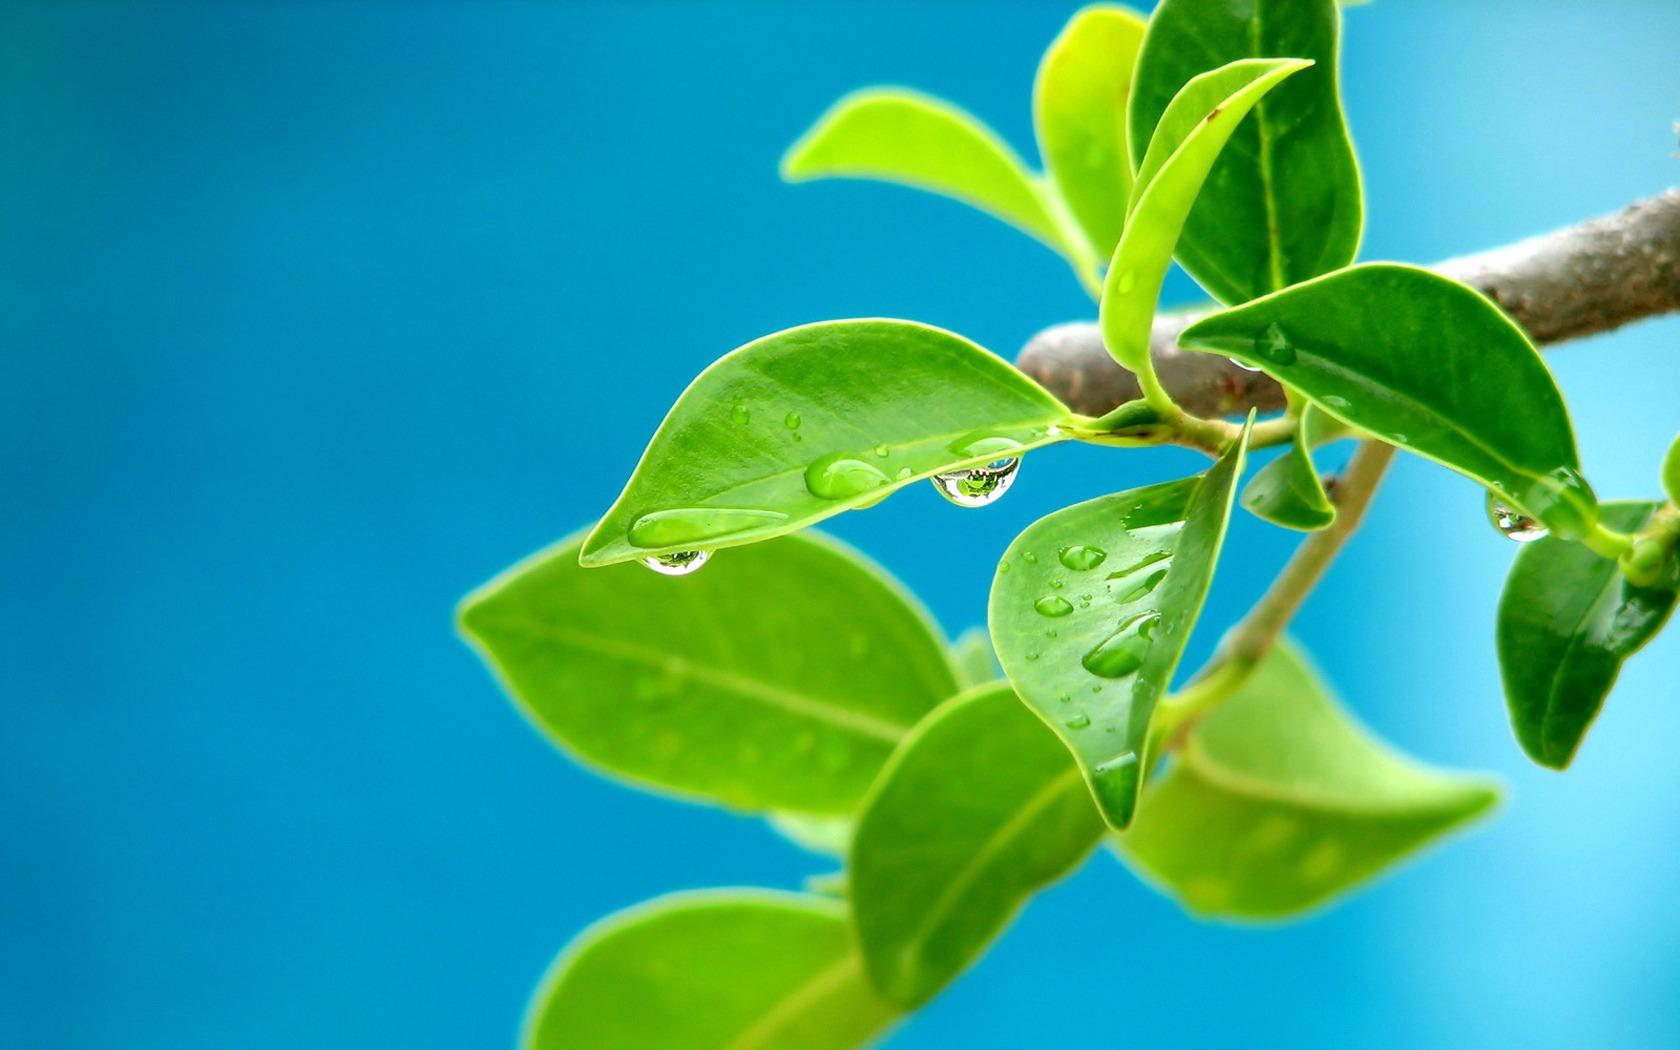 3d Leaves And Water Drop Wallpaper Beautiful Leaves Wallpaper Other Nature Wallpapers In Jpg